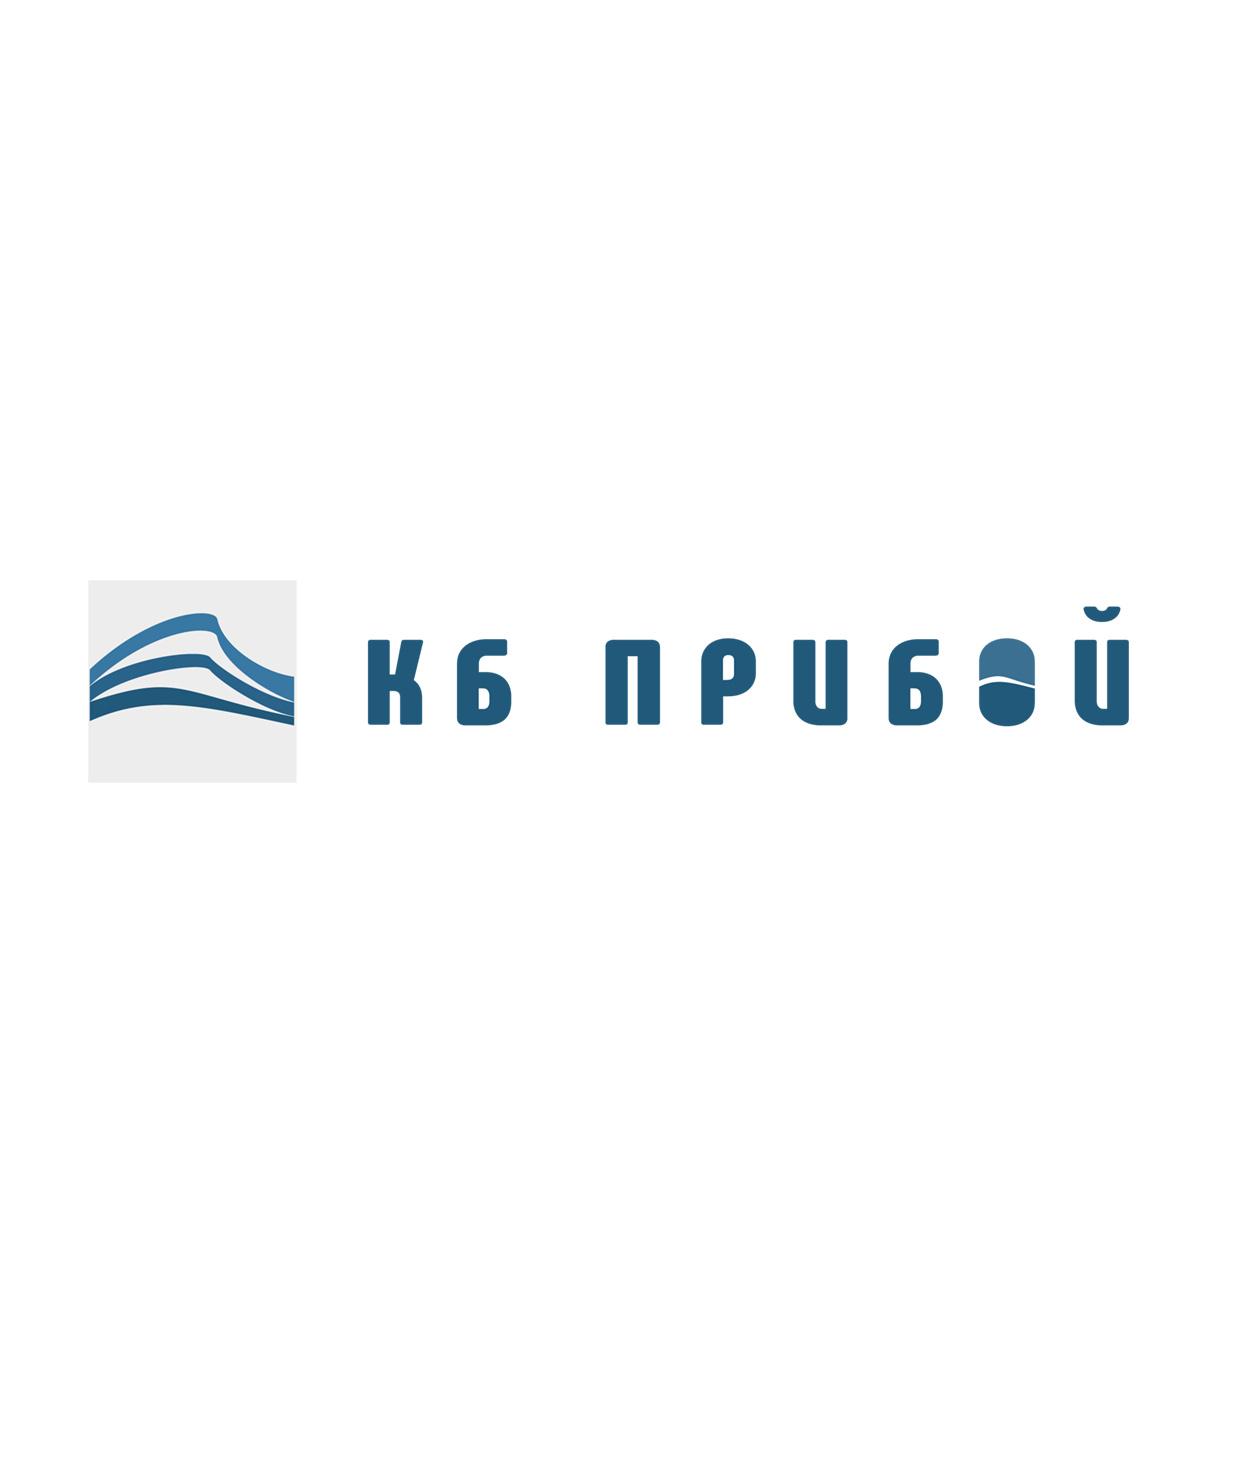 Разработка логотипа и фирменного стиля для КБ Прибой фото f_3185b2bd2eb0dc35.jpg